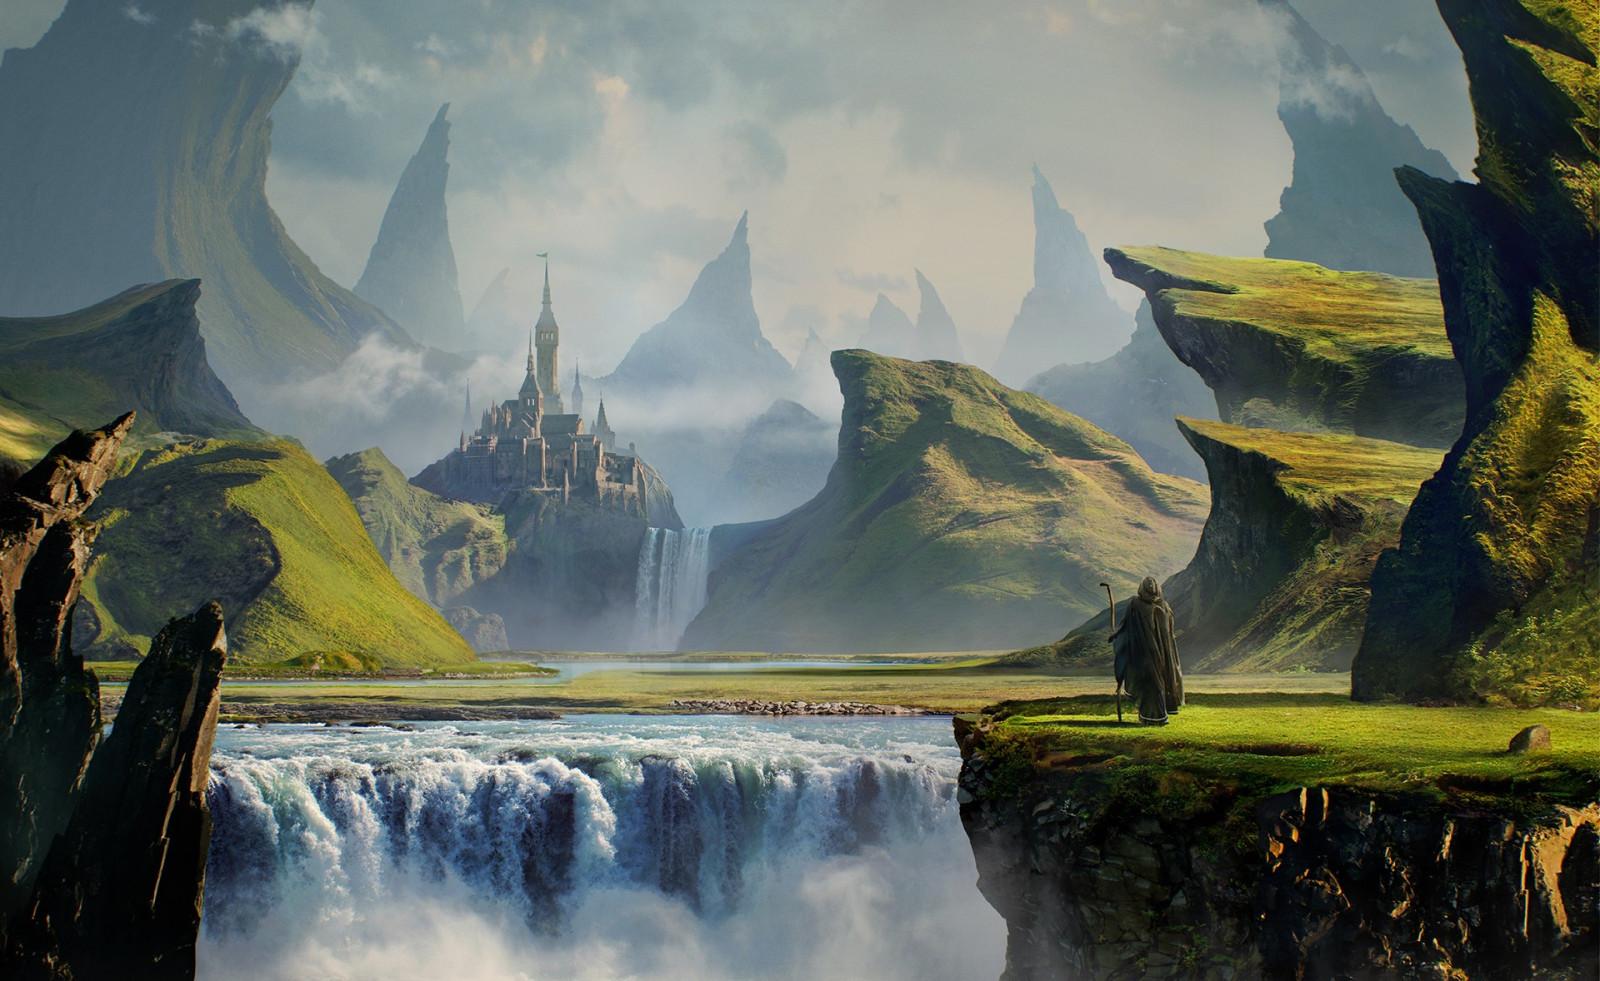 1920x1178_px_castle_deviantart_digital_art_landscape_mountain_river-792569.jpg!d